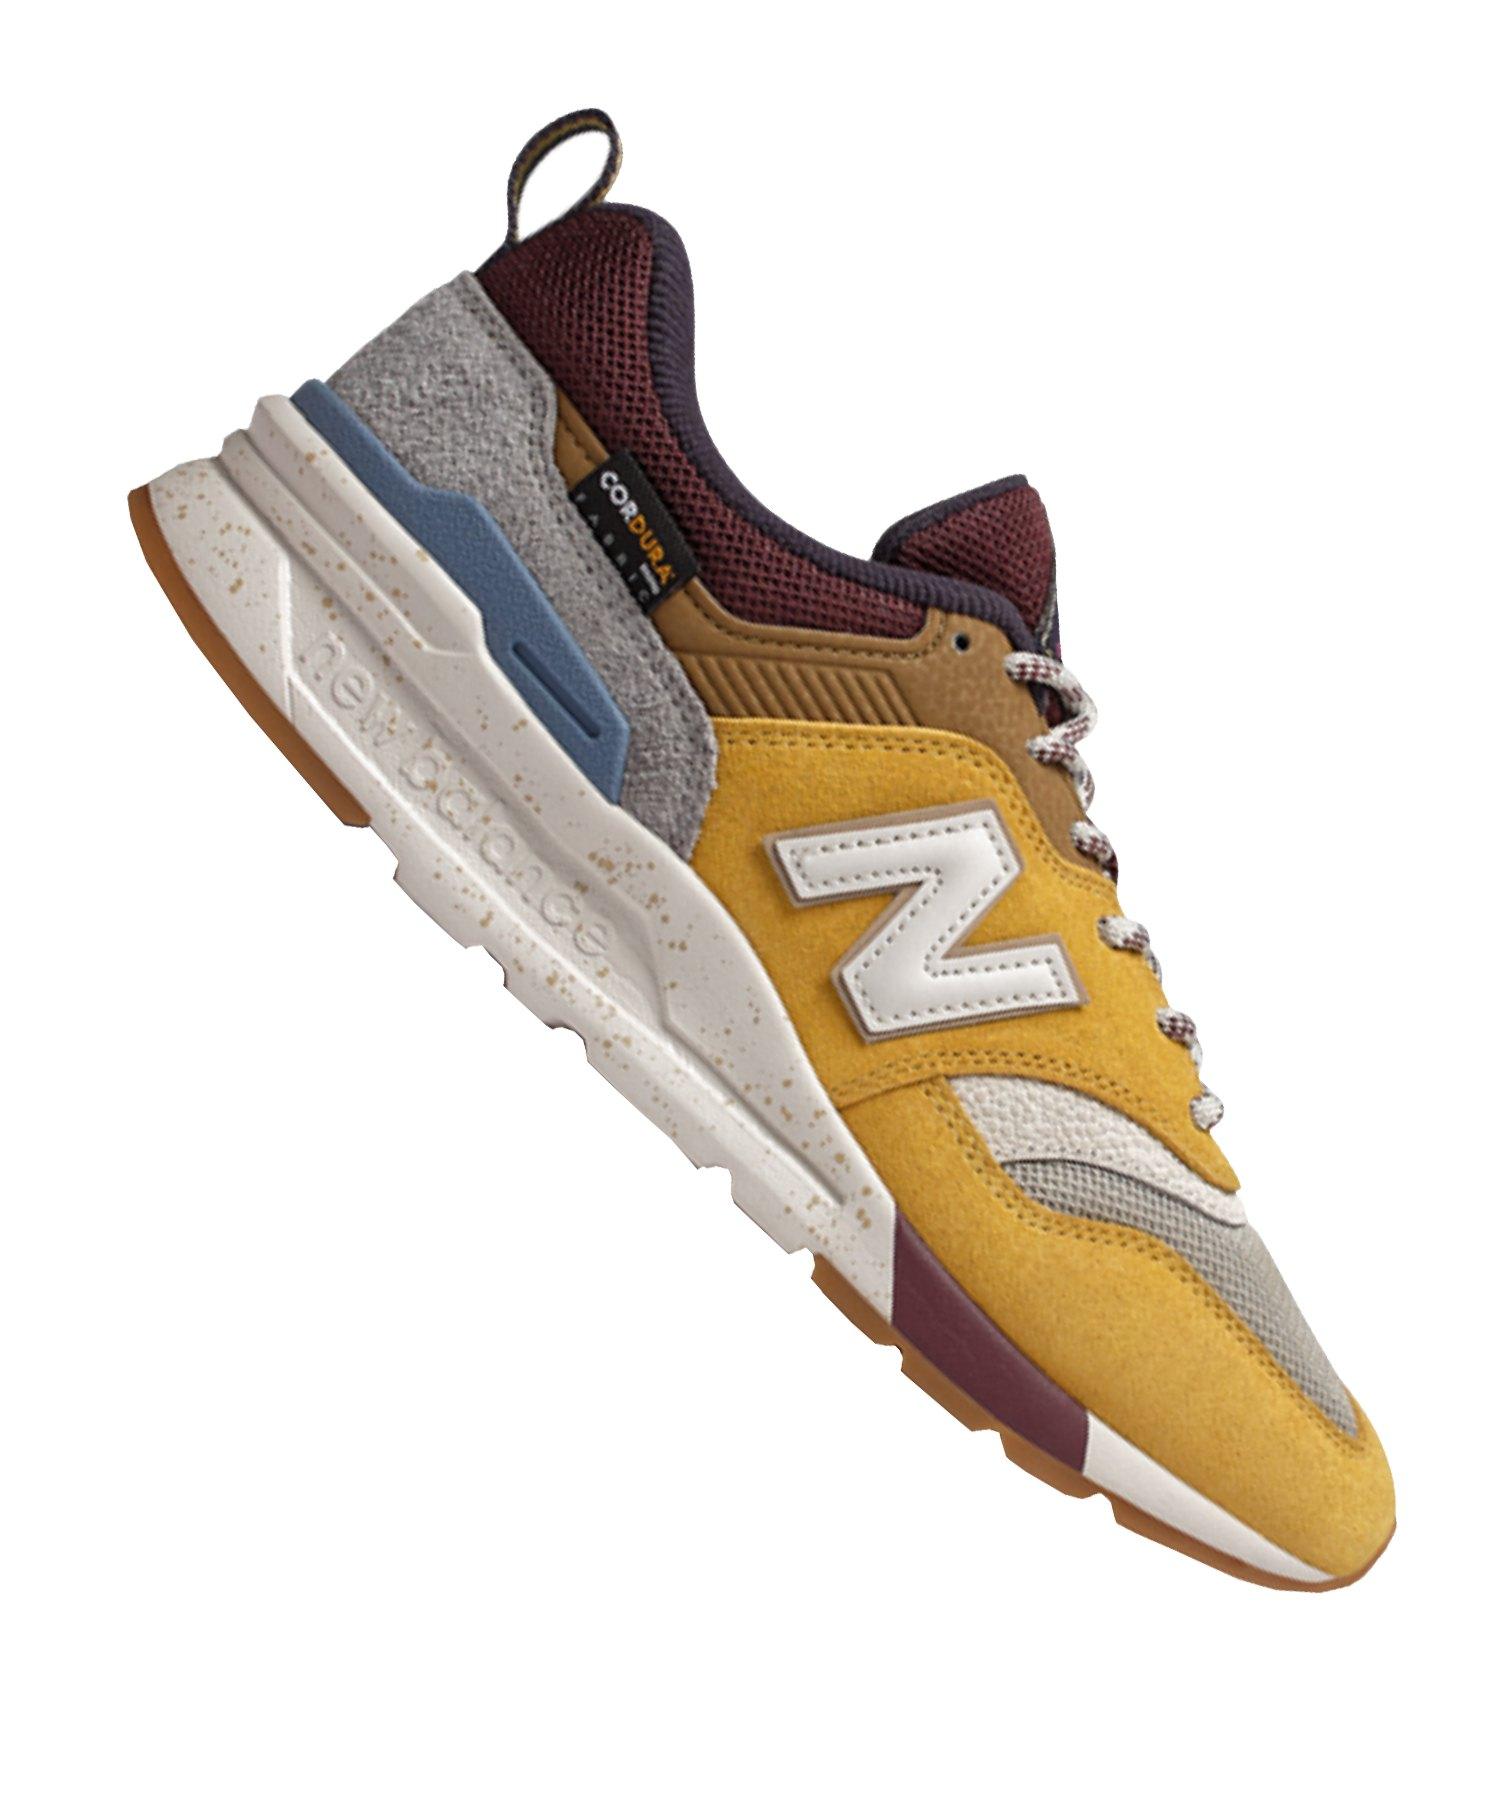 New Balance CW997 B Sneaker Damen Gelb F07 - gelb